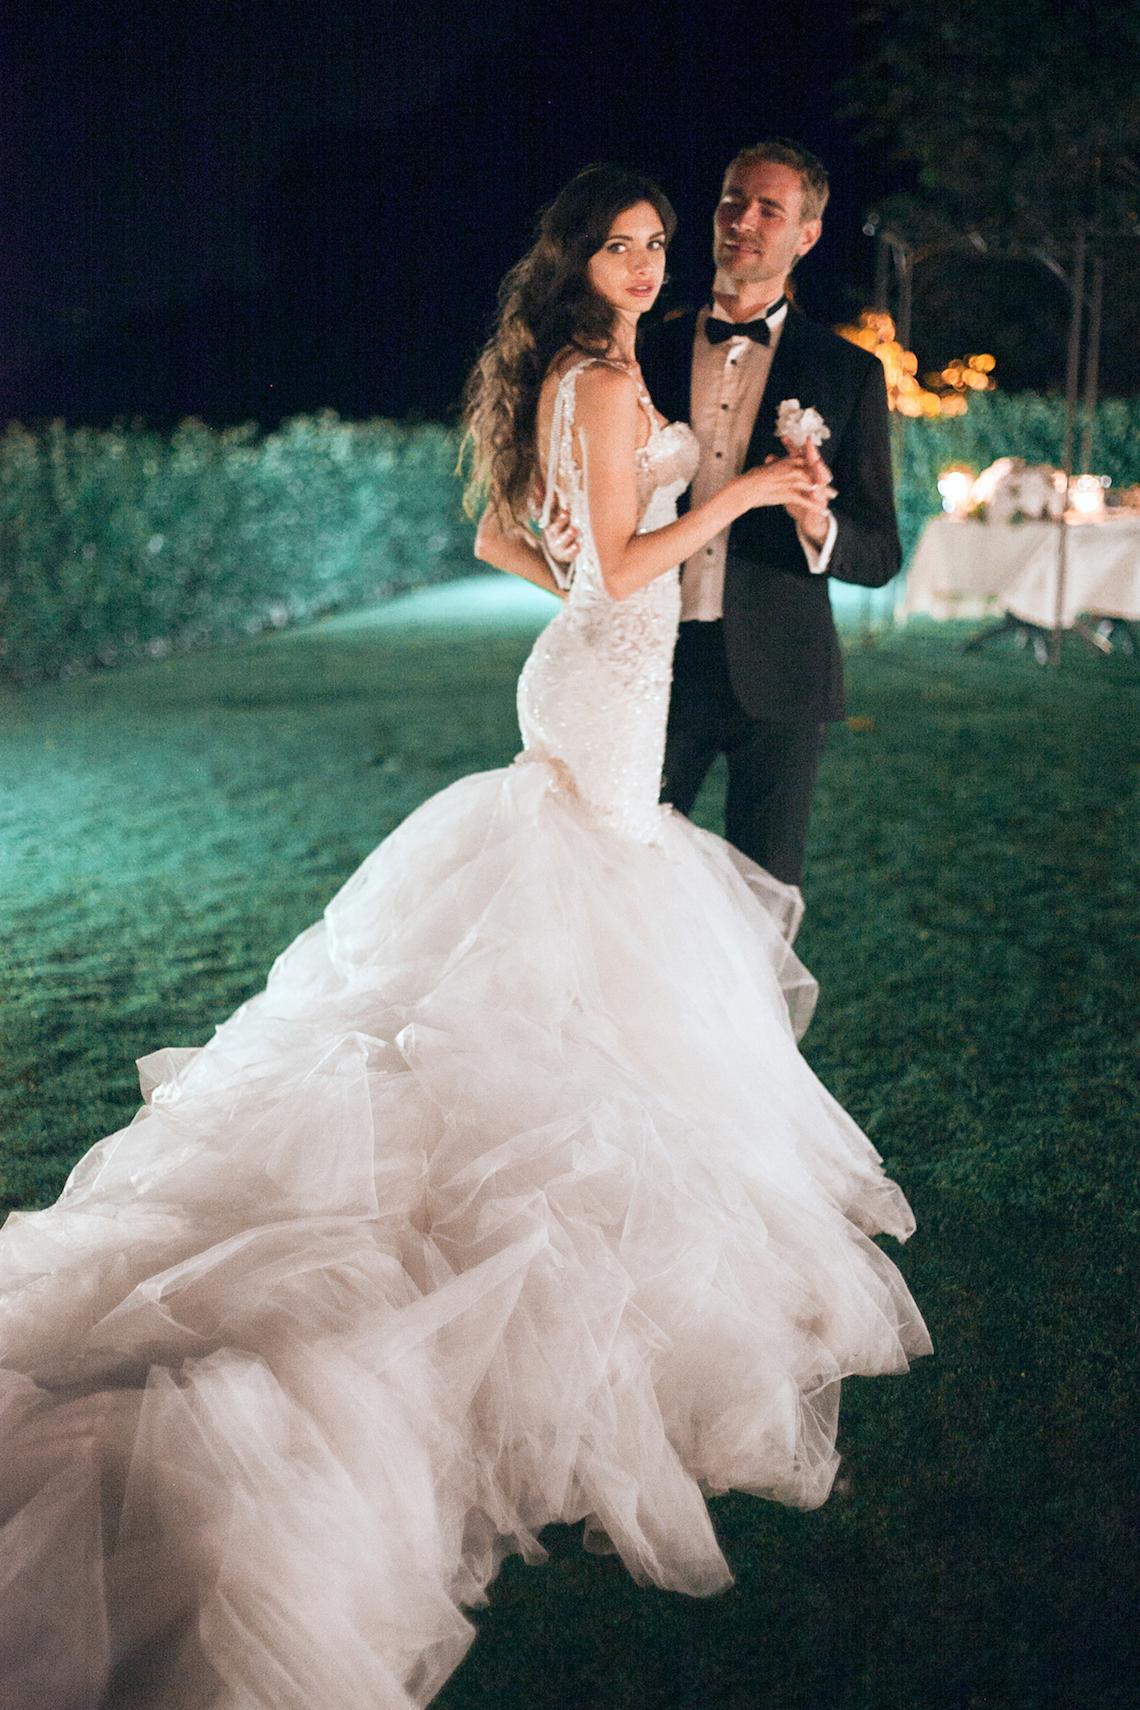 Destination-Wedding-in-Lake-Como-by-Orlova-Maria-and-WeddItaly-1